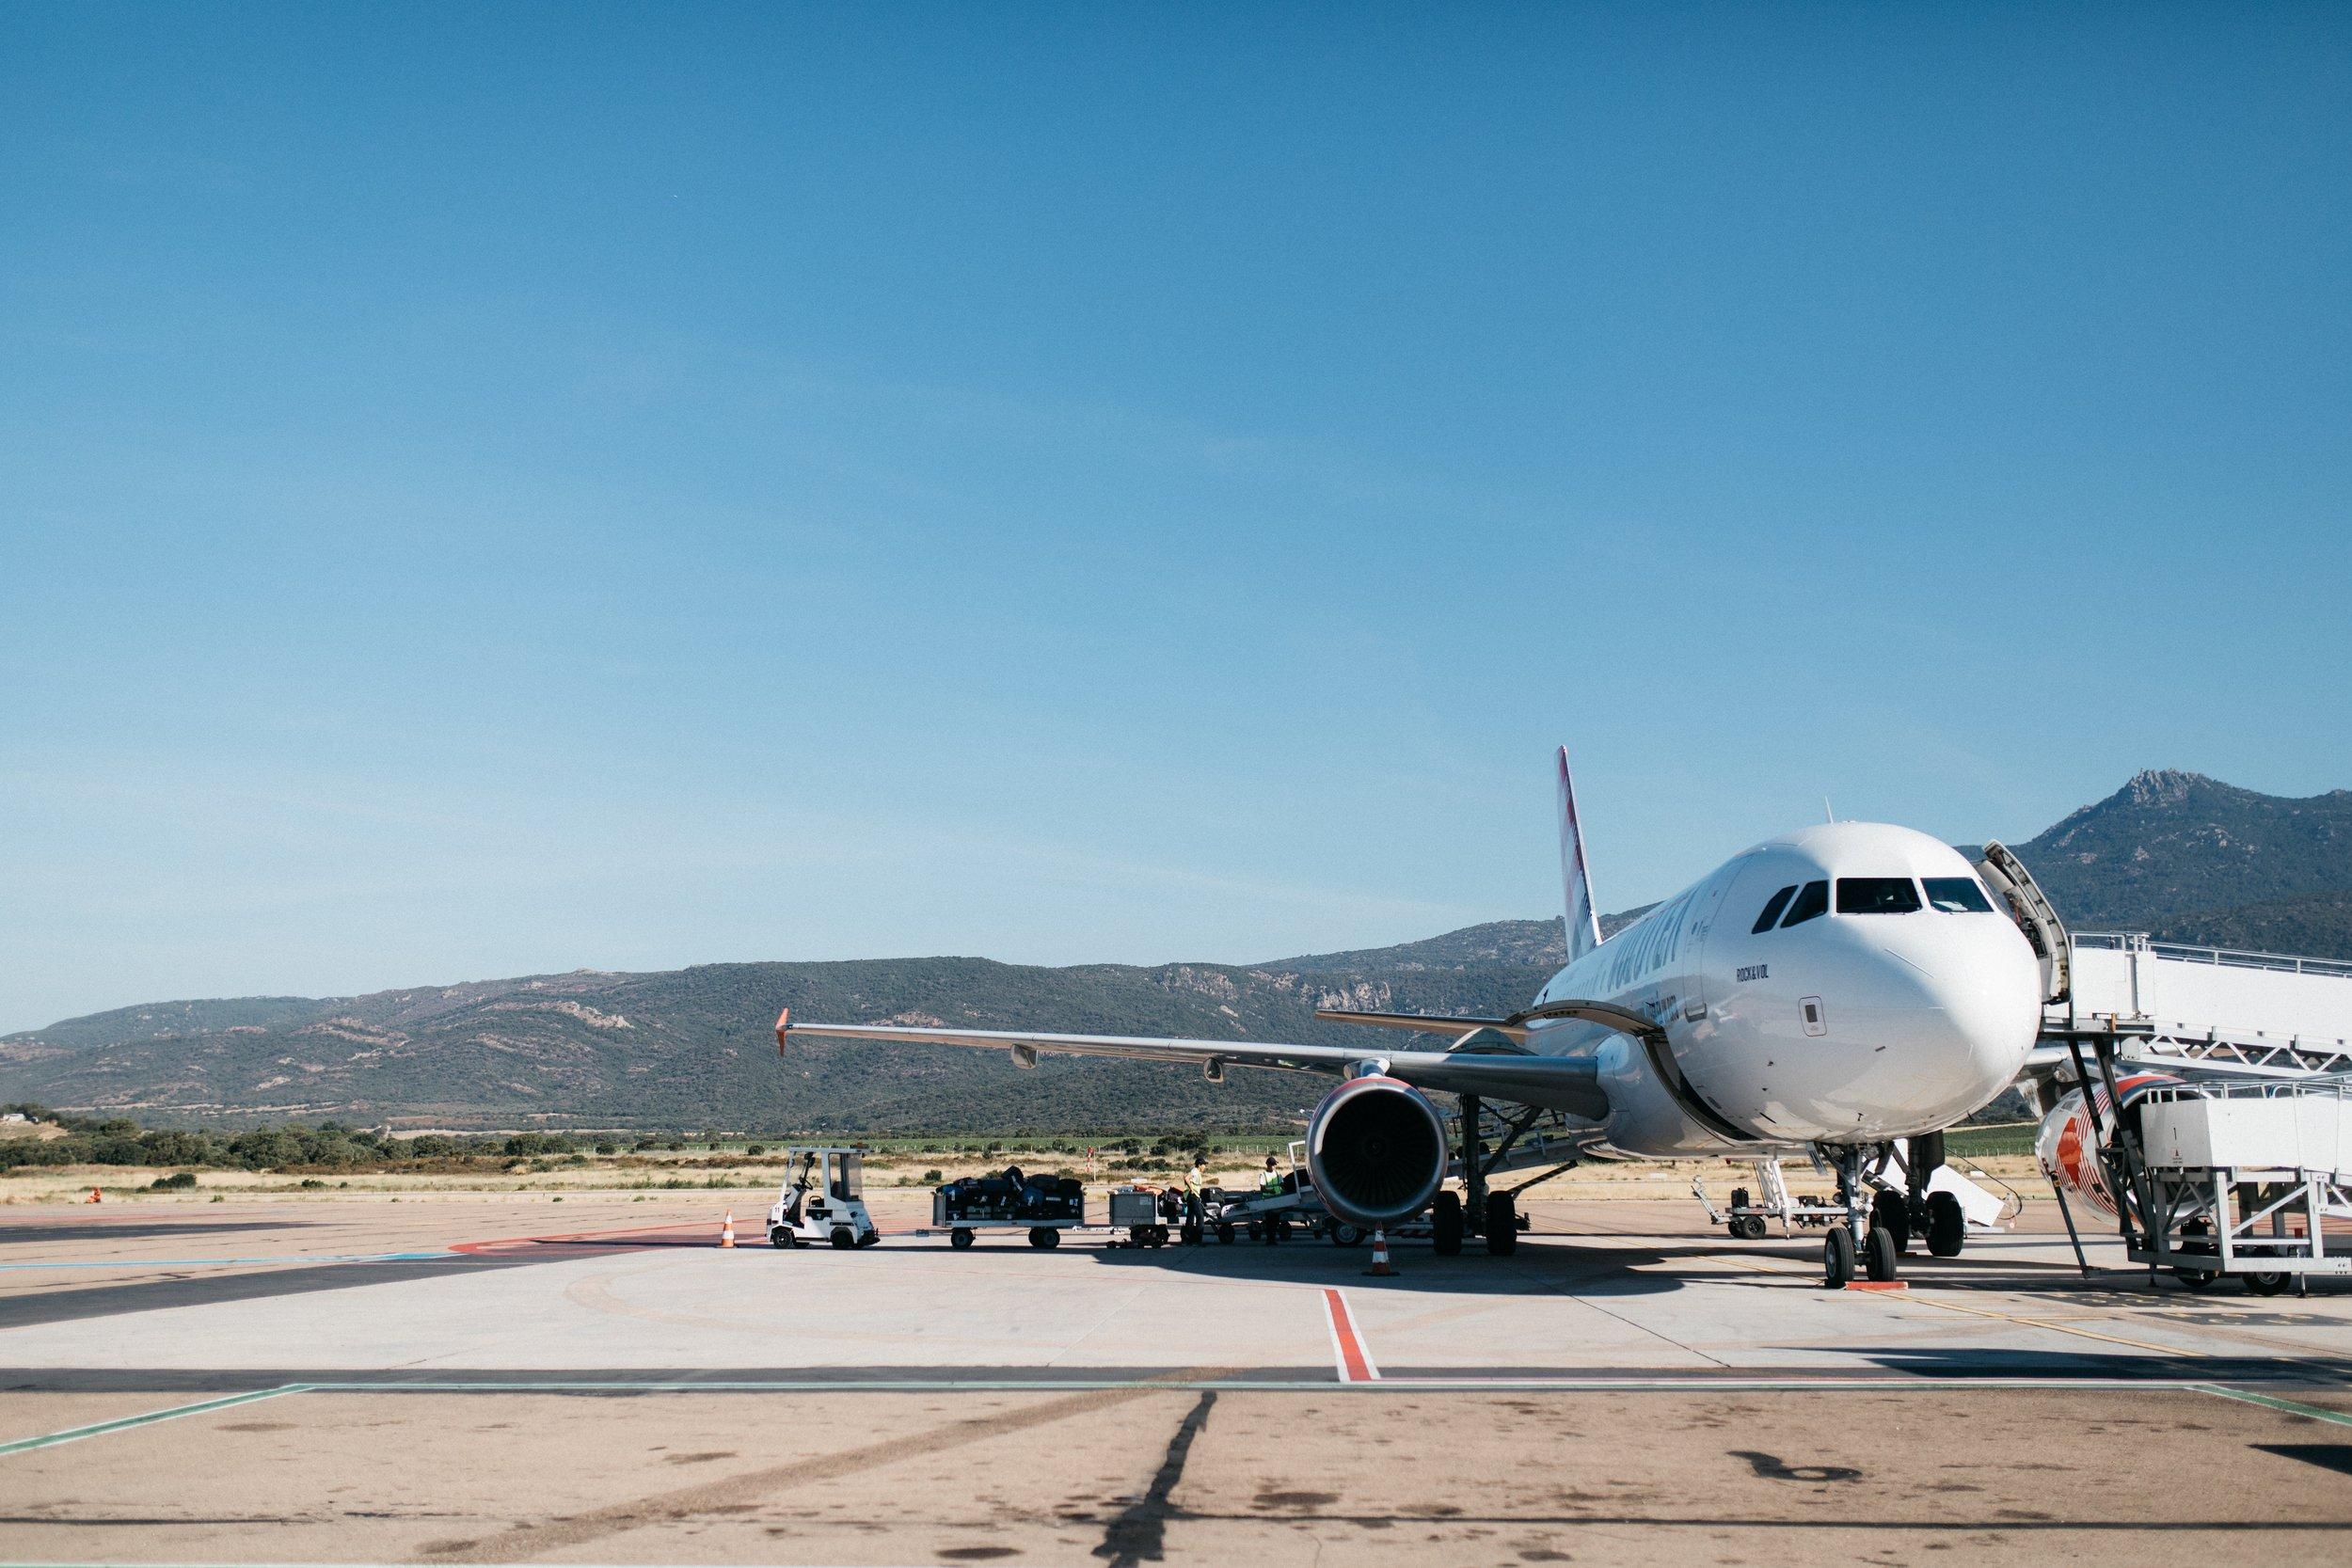 Flying:To Alicante, Murcia, or Malaga -